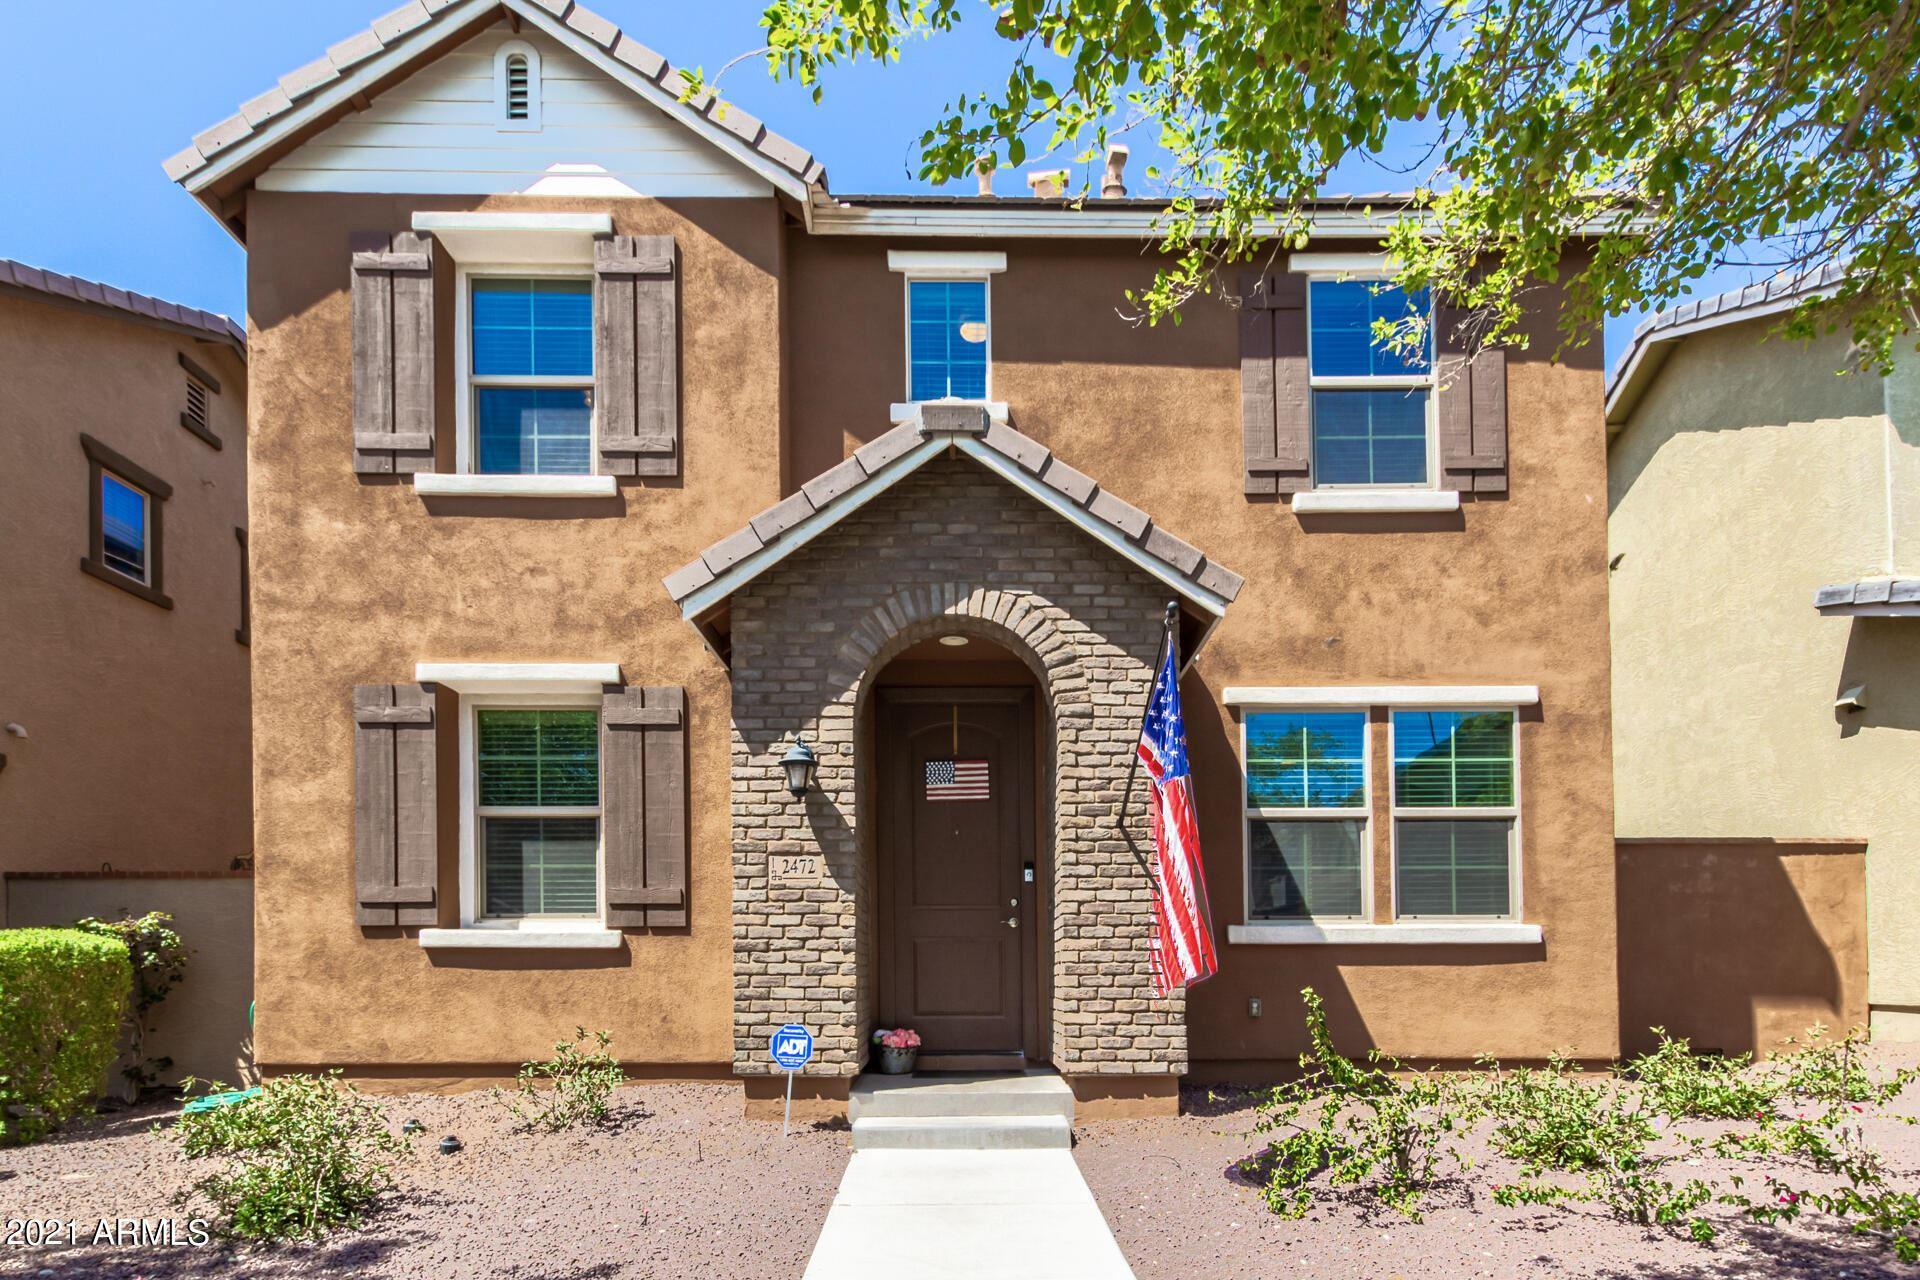 2472 N EASTVIEW Way, Buckeye, AZ 85396 - MLS#: 6262730